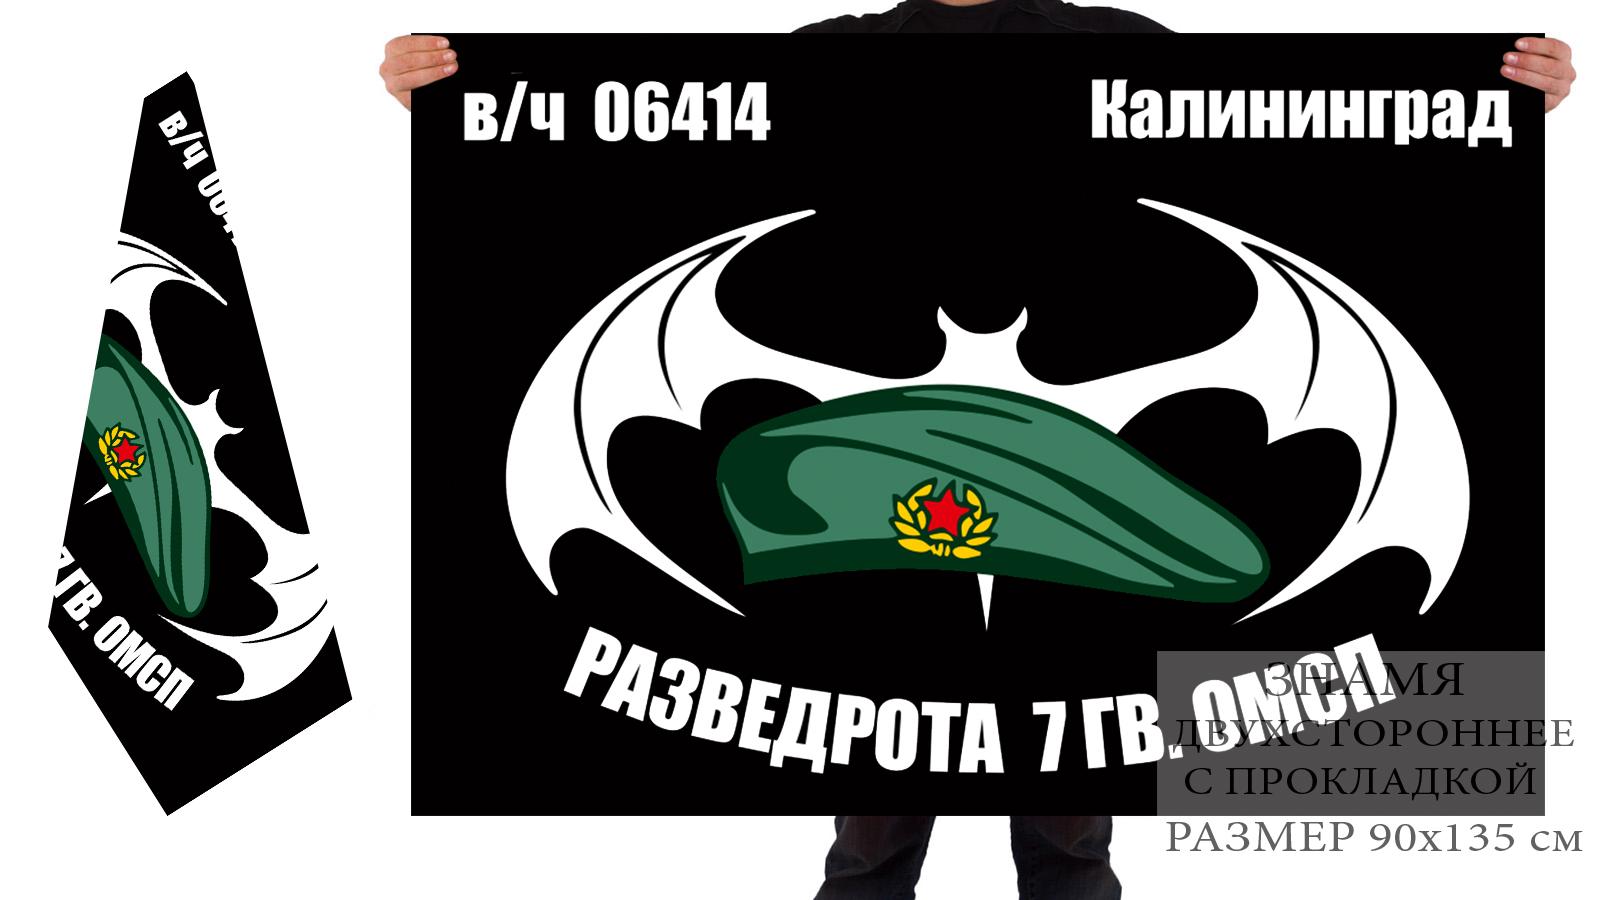 Двусторонний флаг Разведроты 7 ОМСП